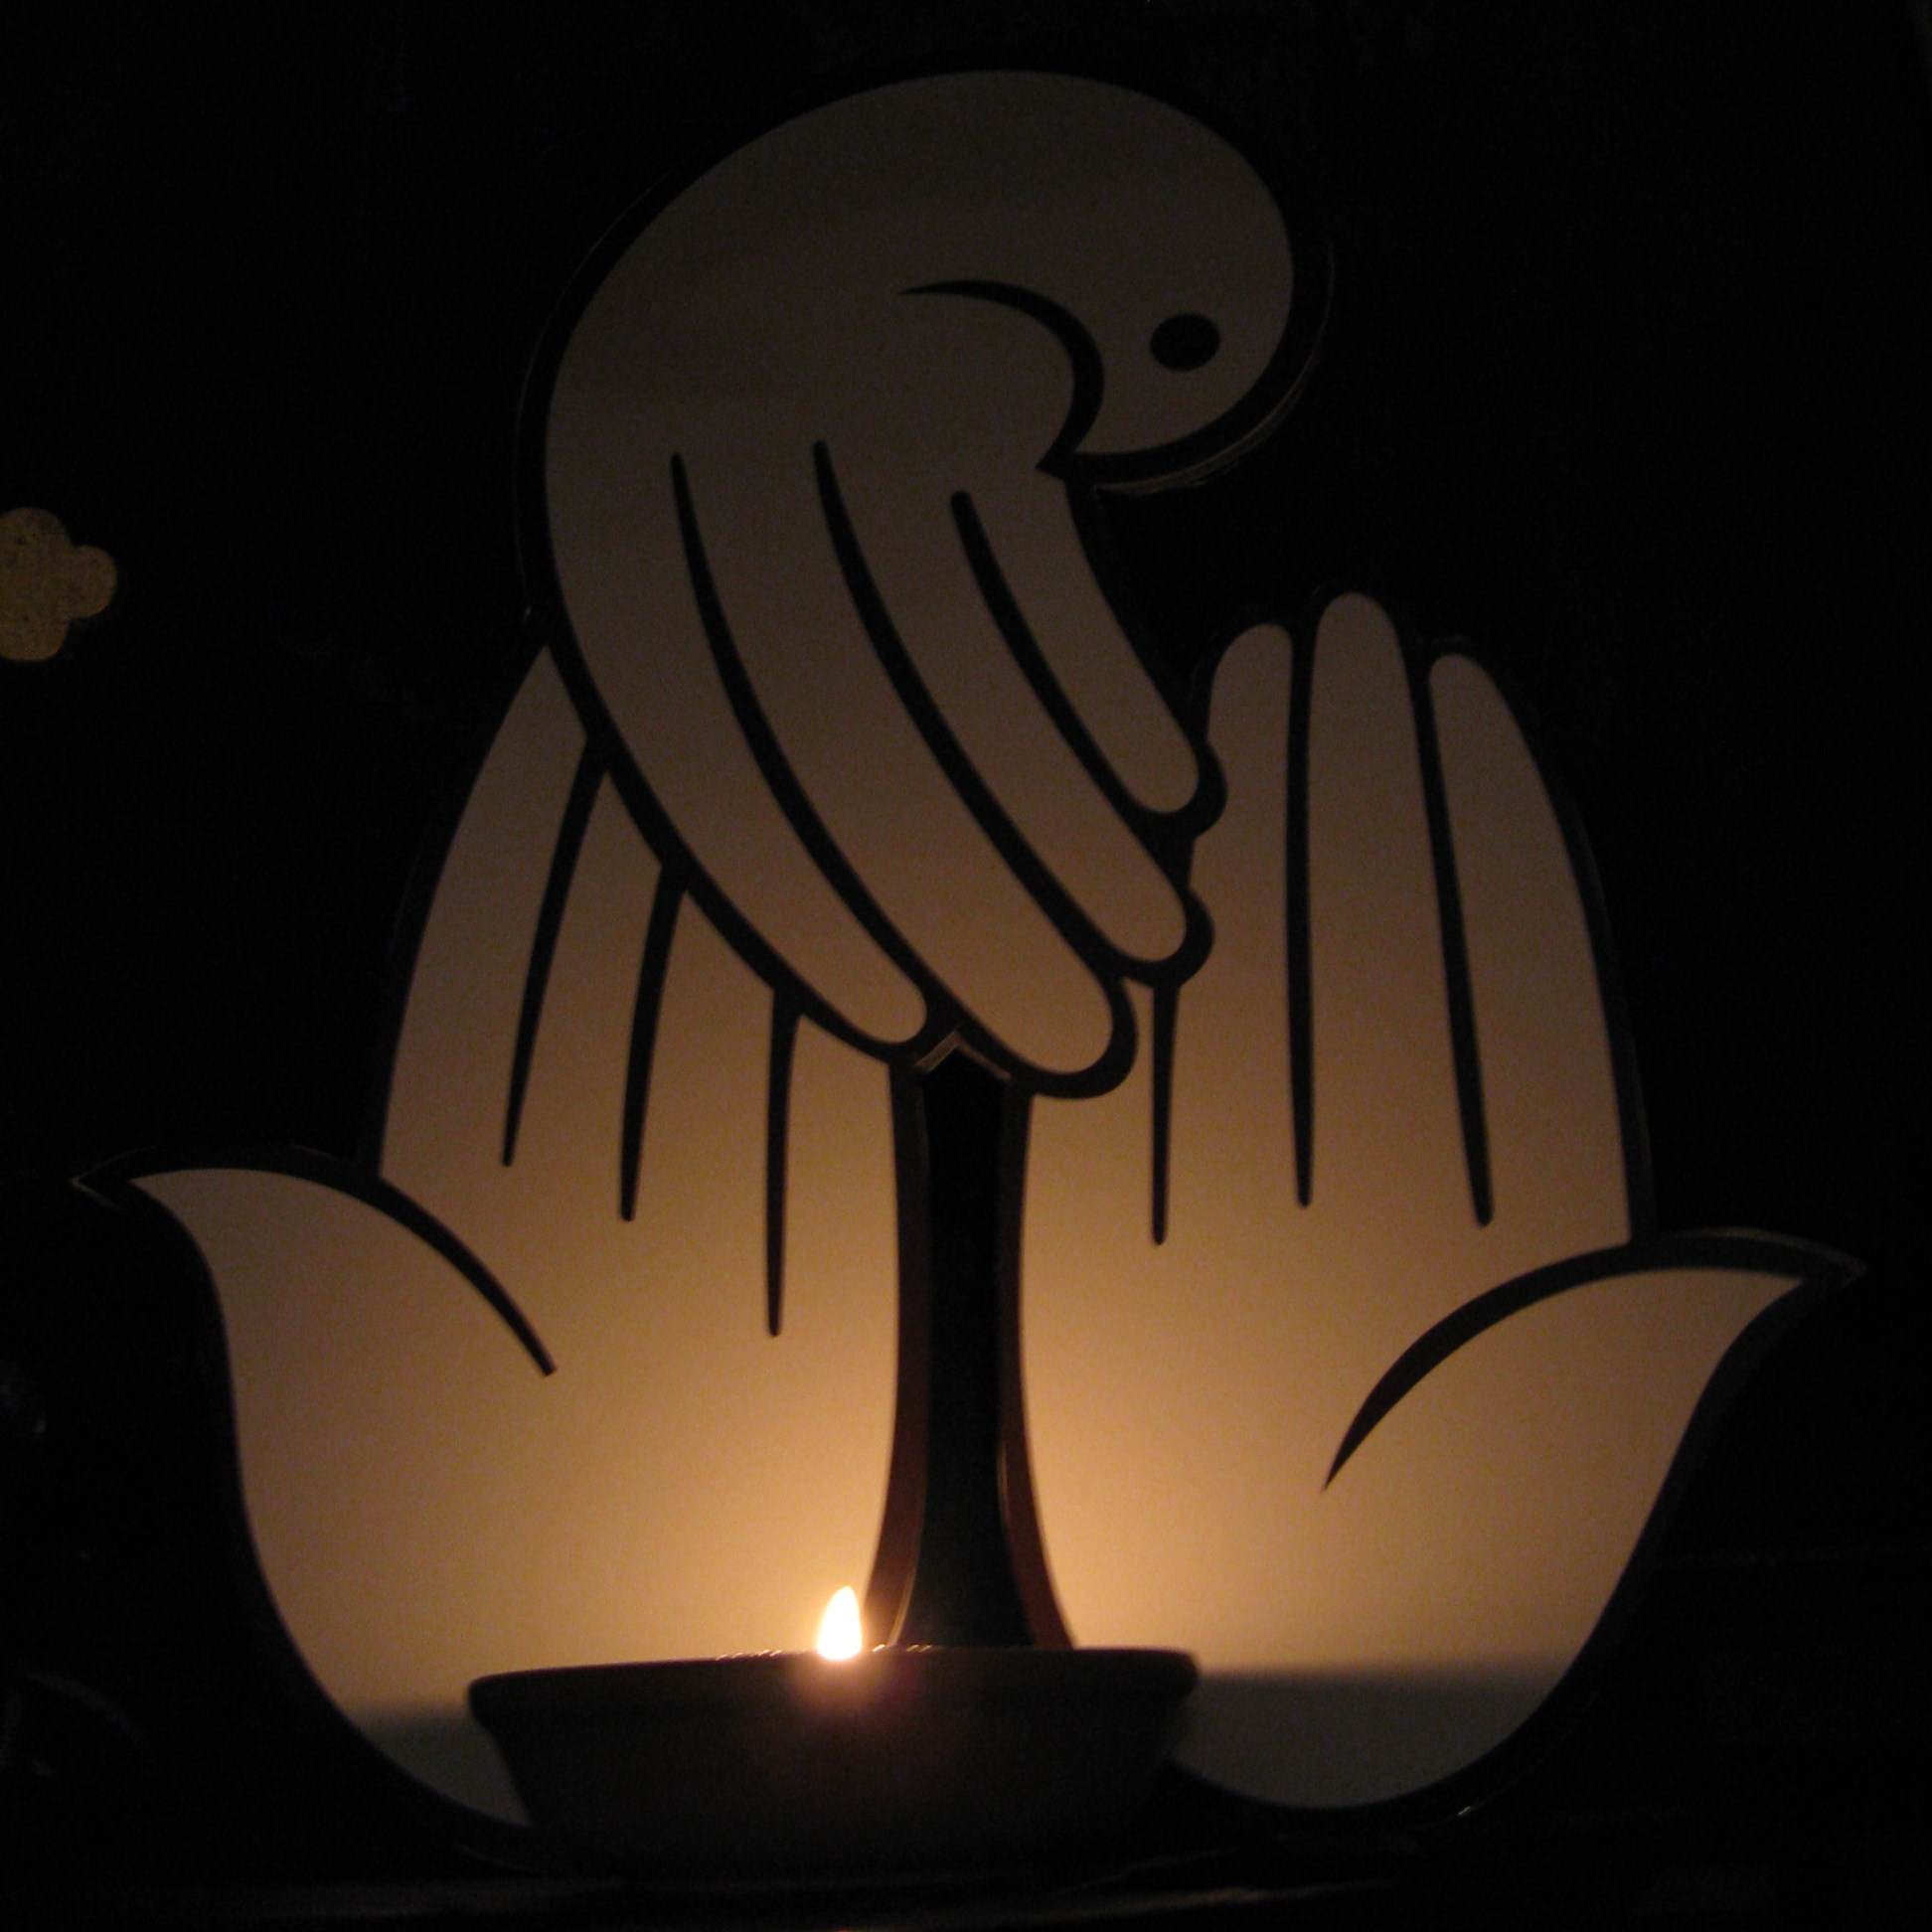 Kako smo letos molili za mir?